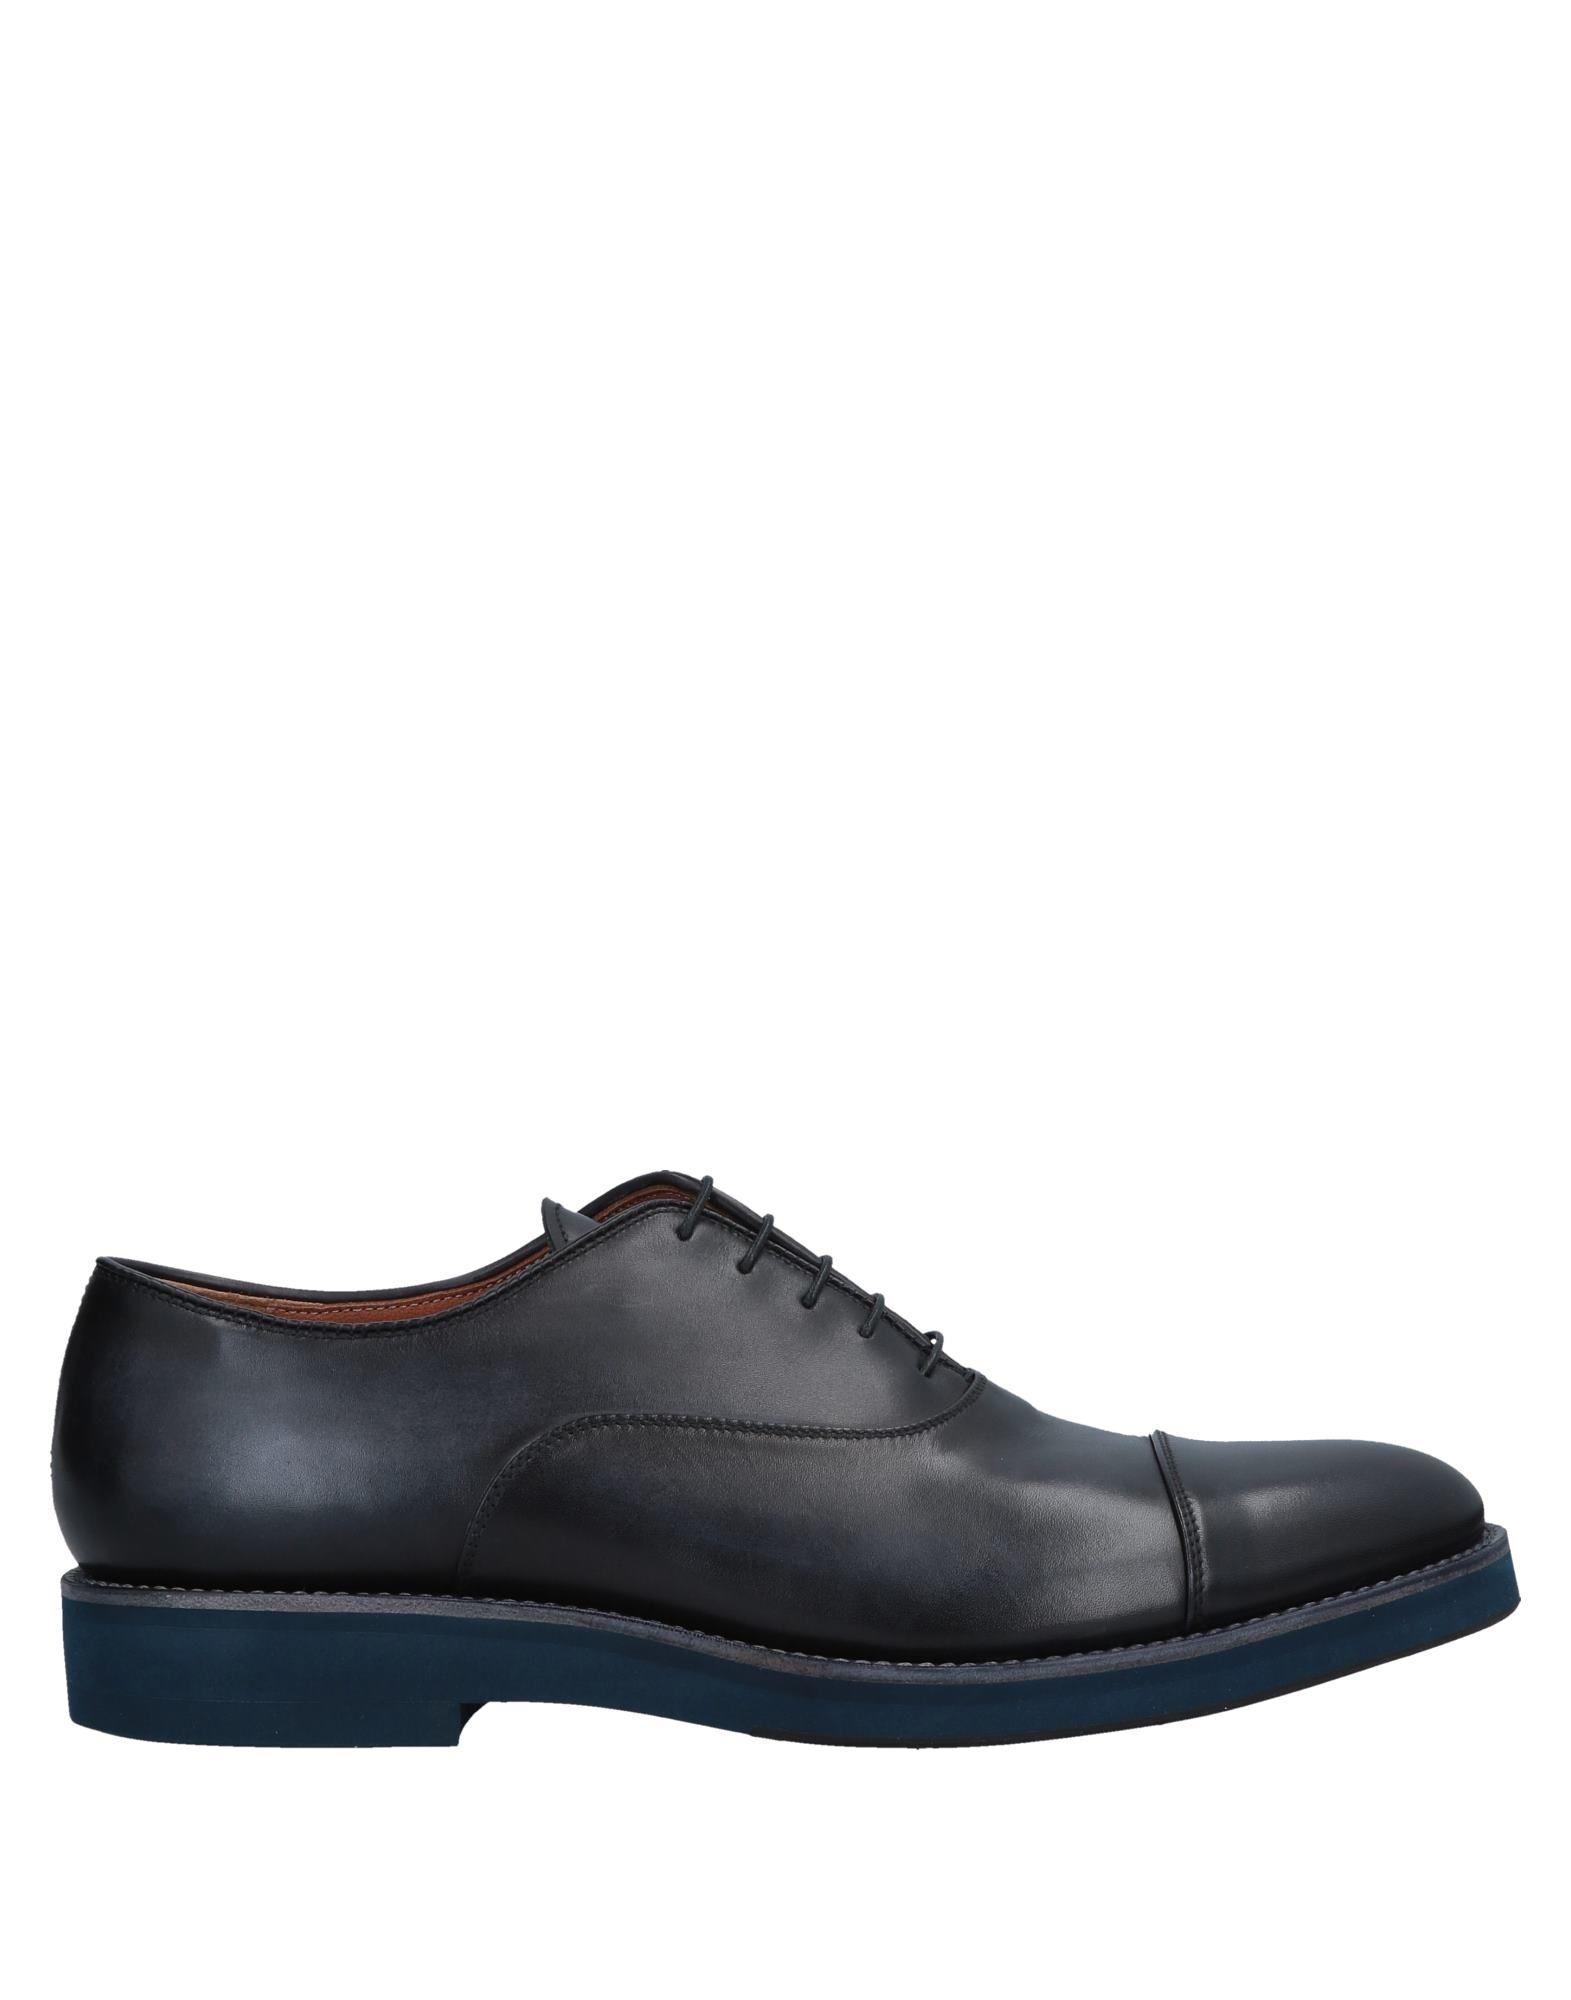 Фото - PREMIATA Обувь на шнурках обувь на высокой платформе dkny